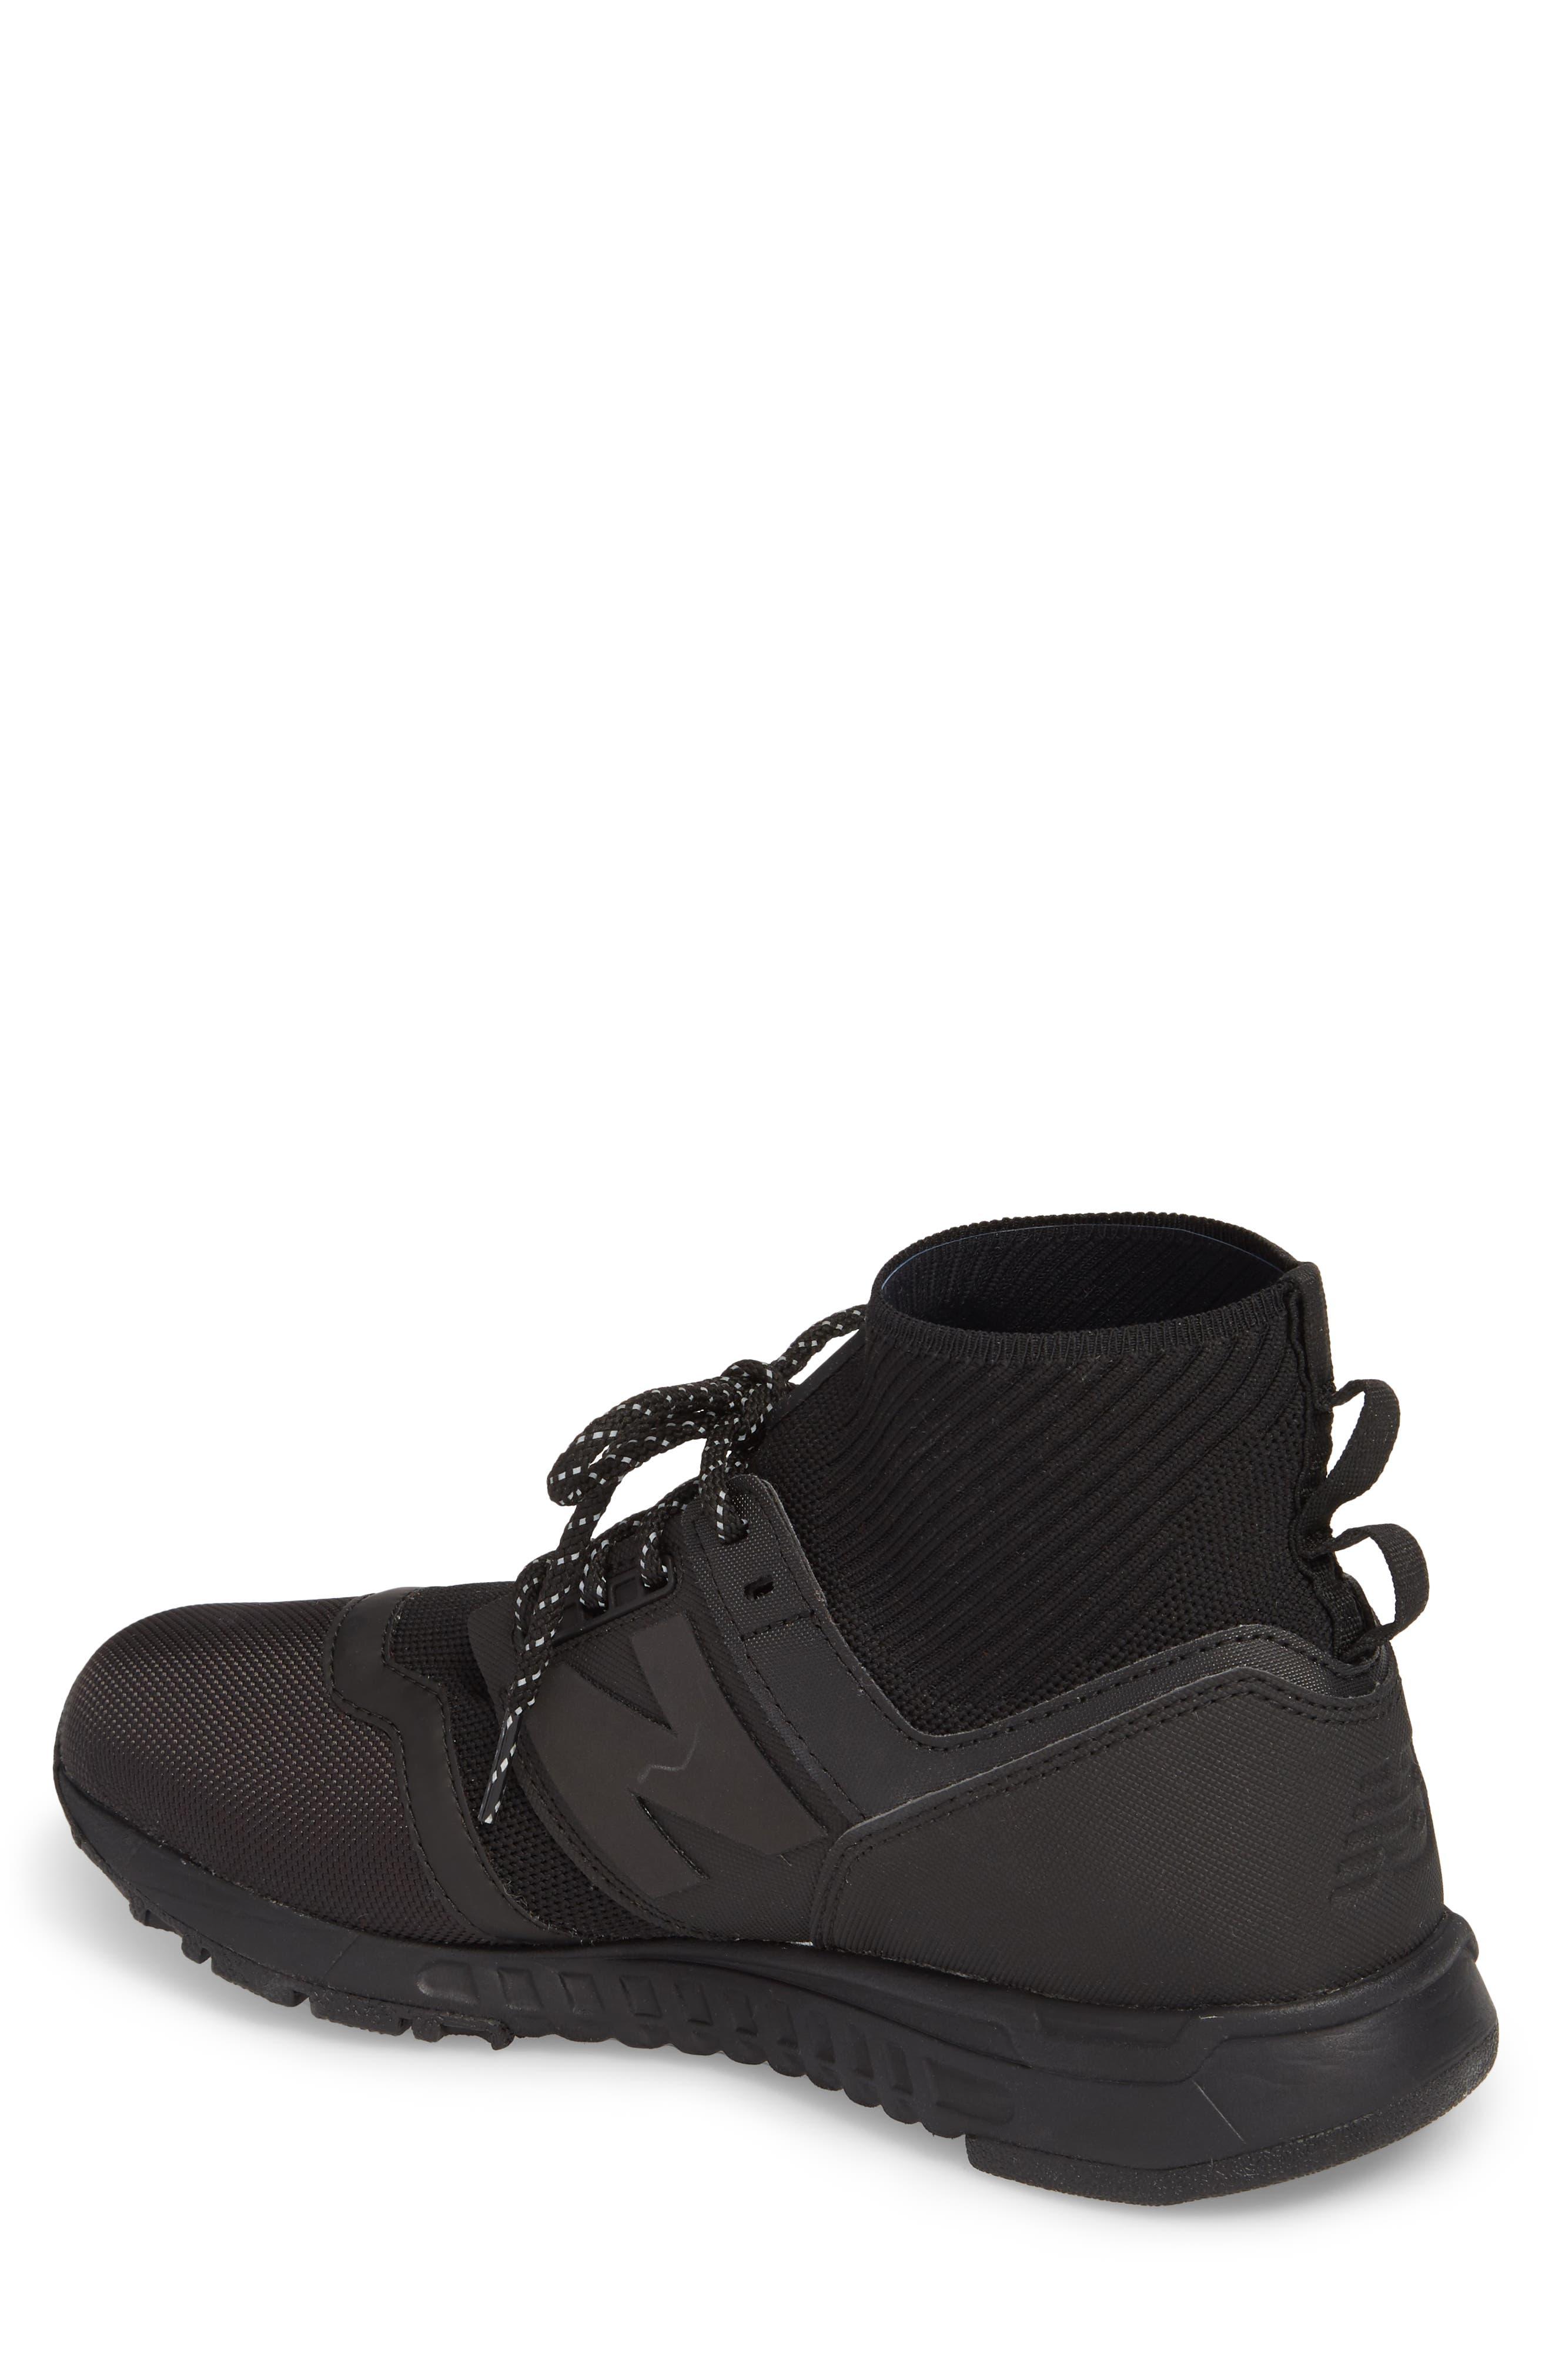 247 Mid Sneaker,                             Alternate thumbnail 5, color,